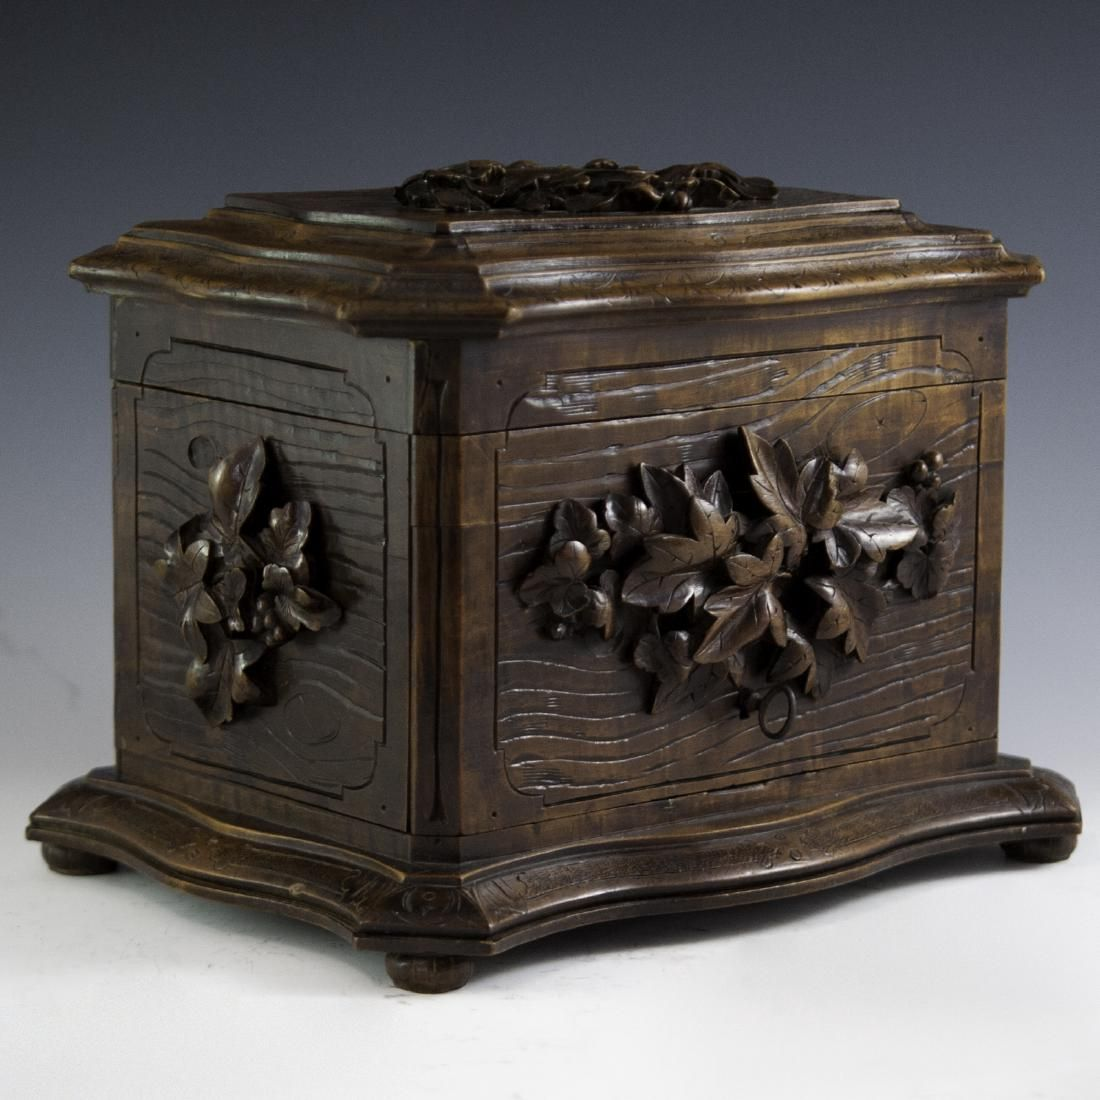 Antique Carved Wooden Cigar Box